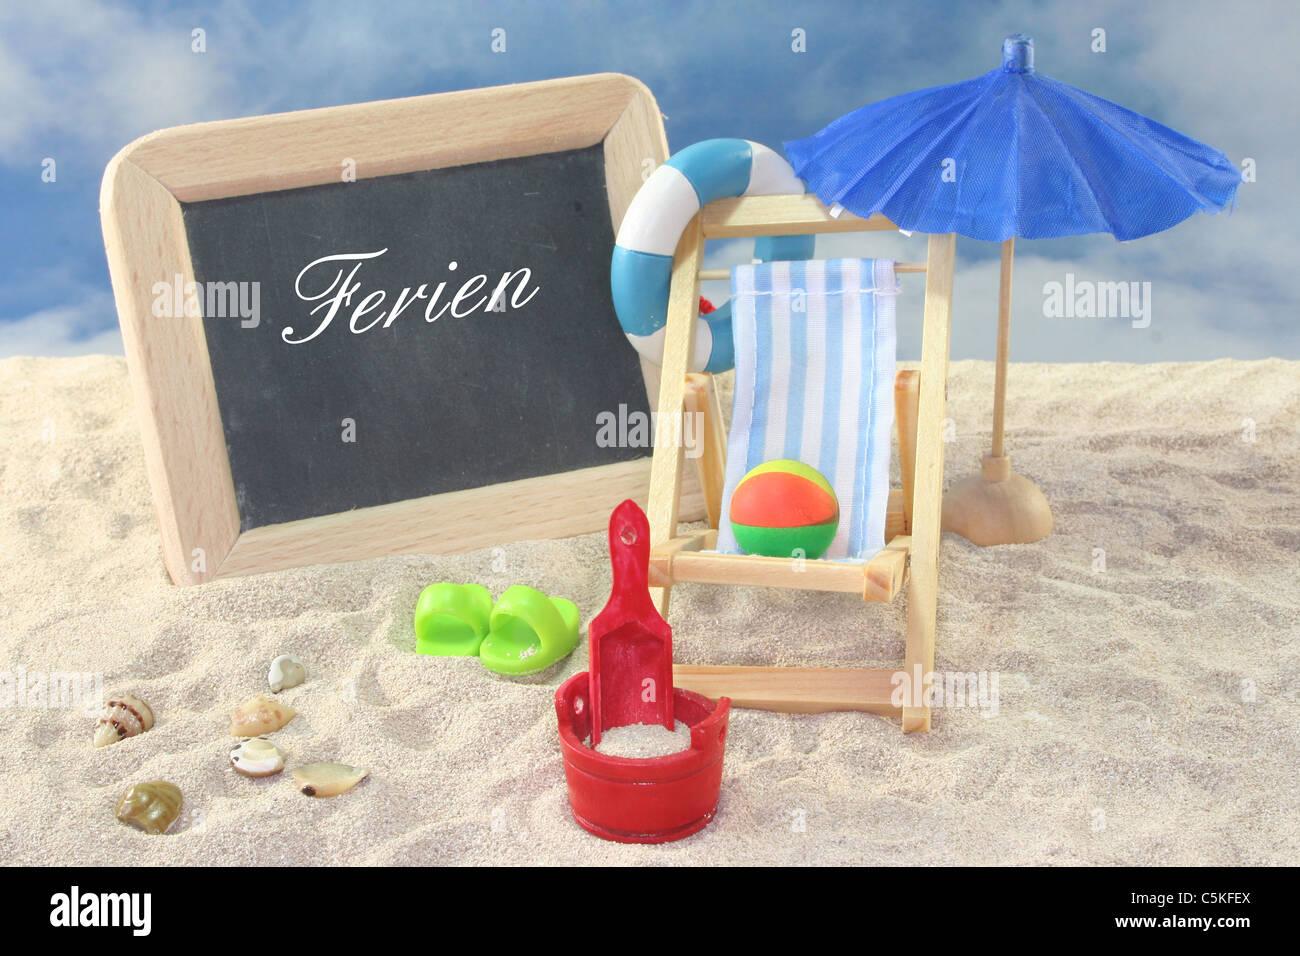 School board and toys on a sandy beach Stock Photo